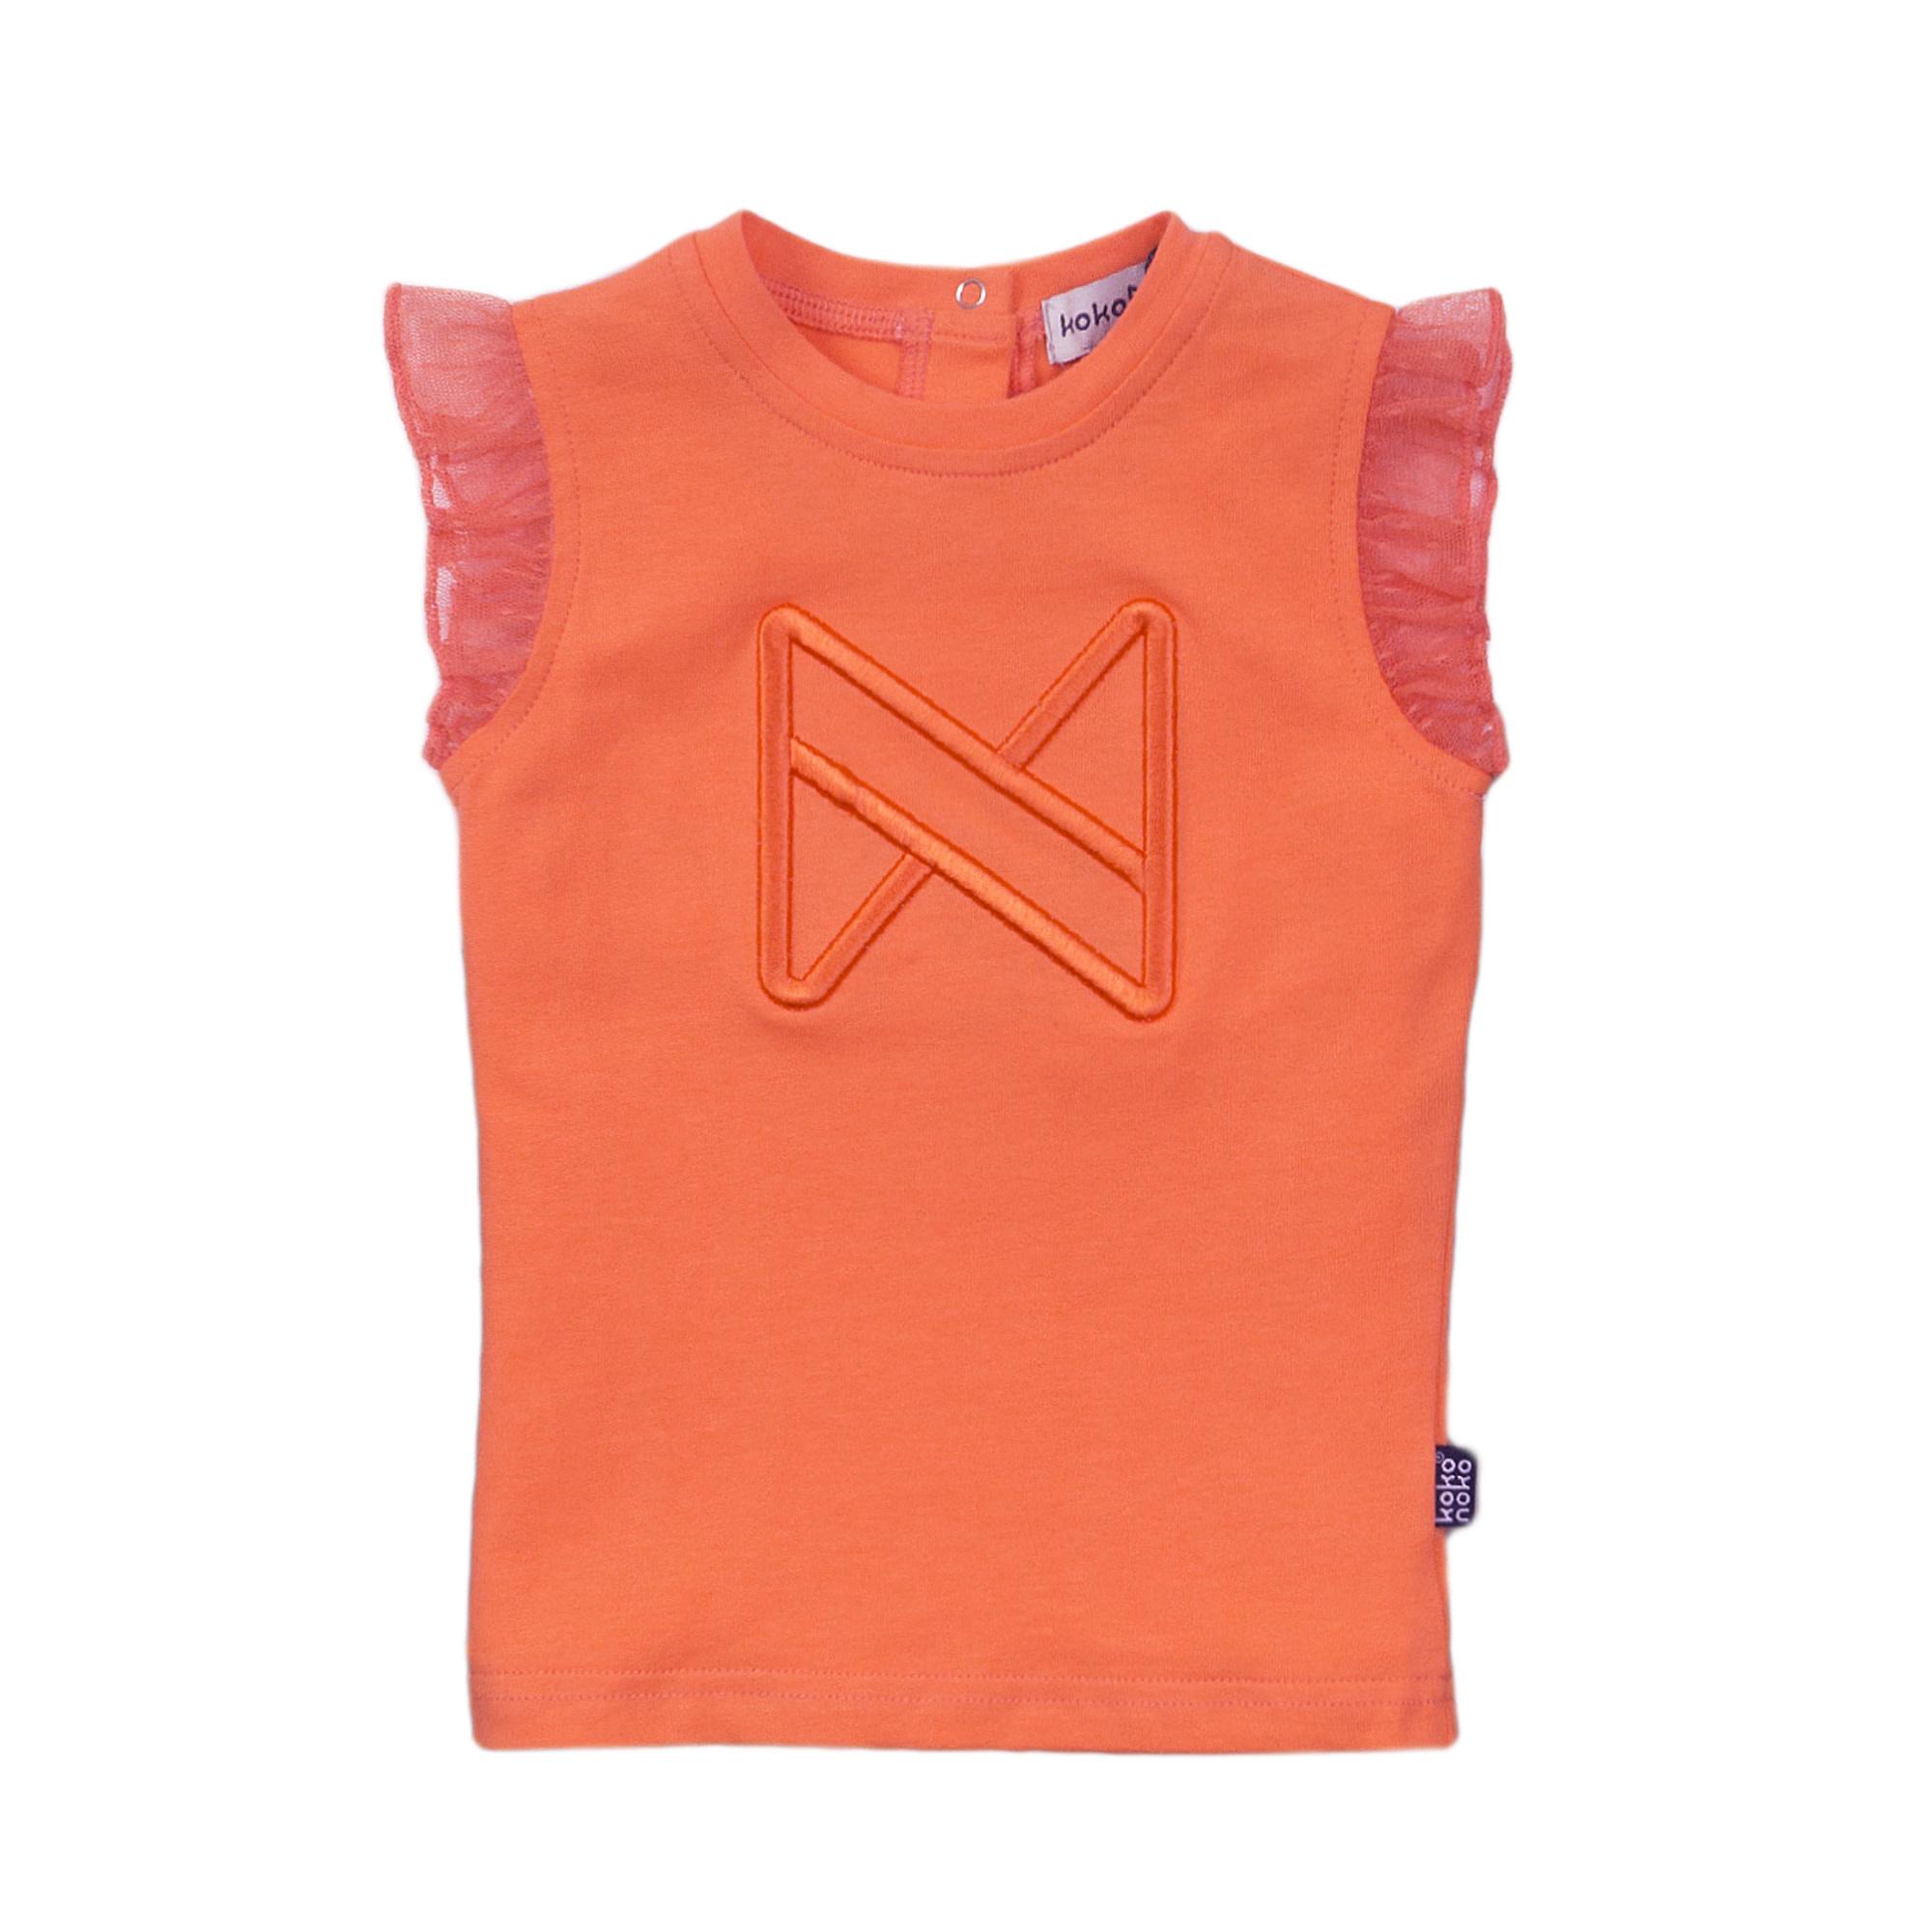 Koko Noko Meisjes Shirtje KM E38954-37-1